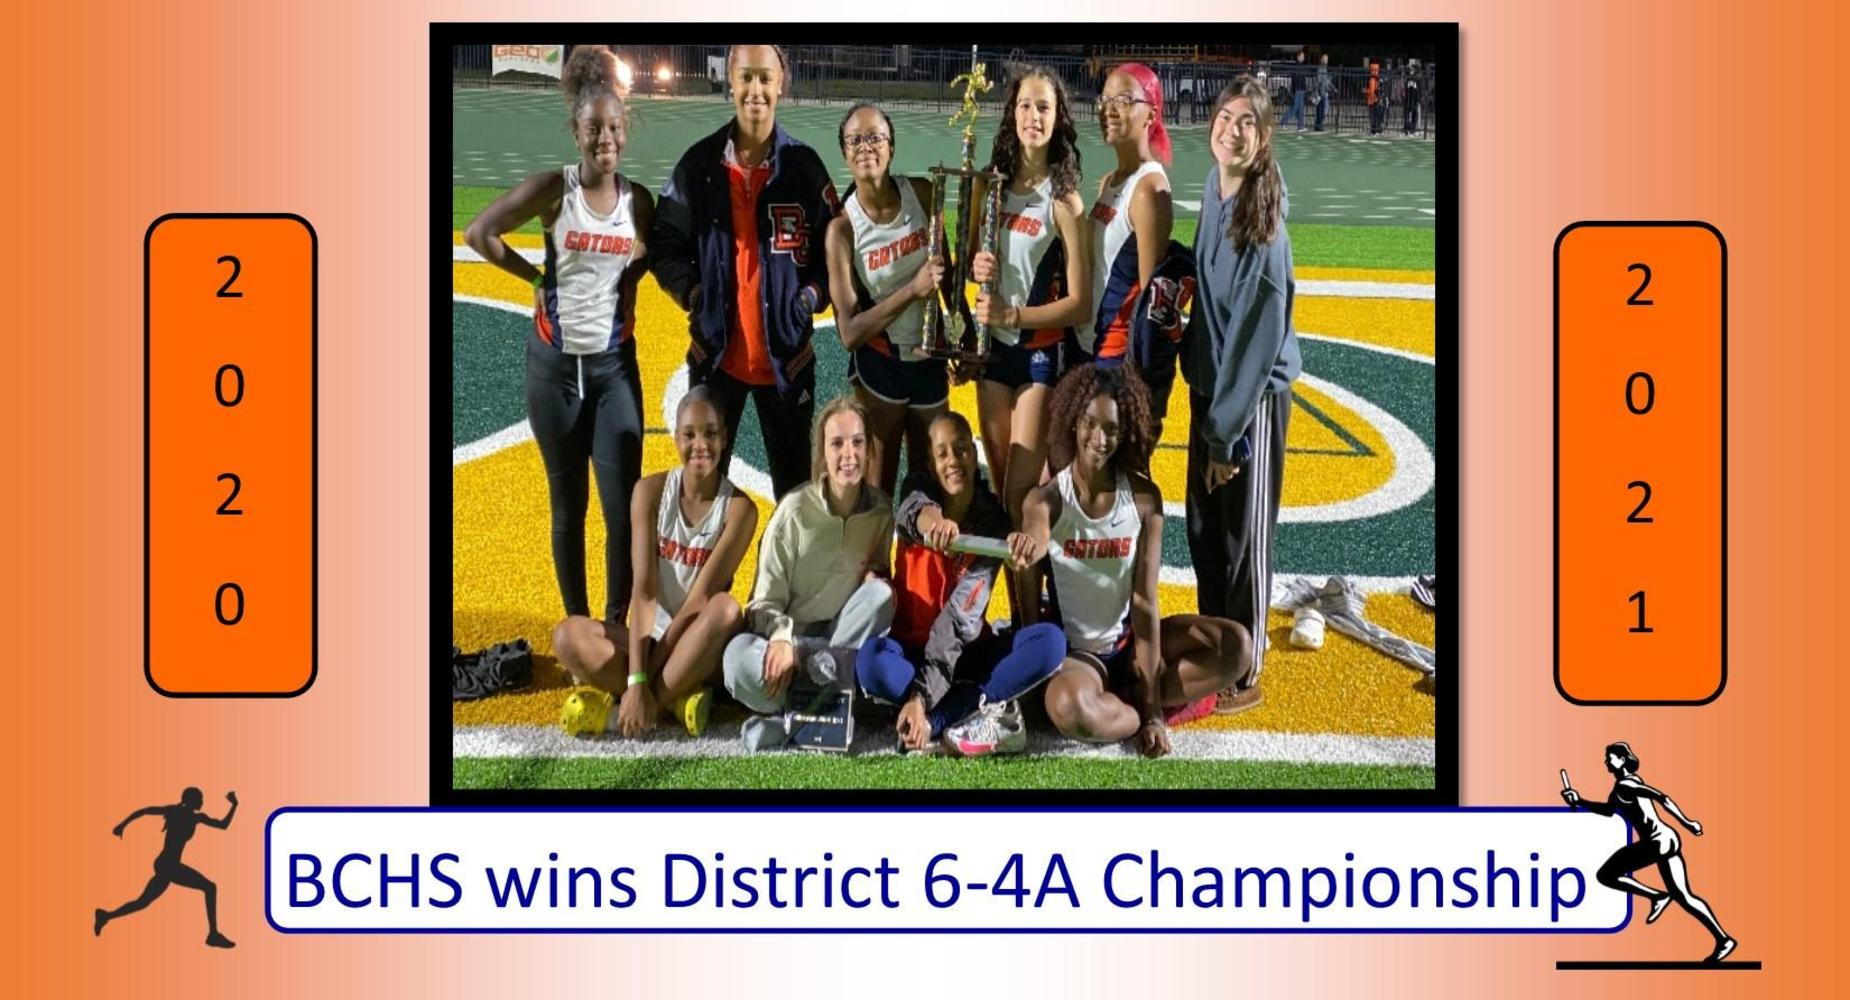 BCHS Girls Track & Field Team wins District 6-4A Championship